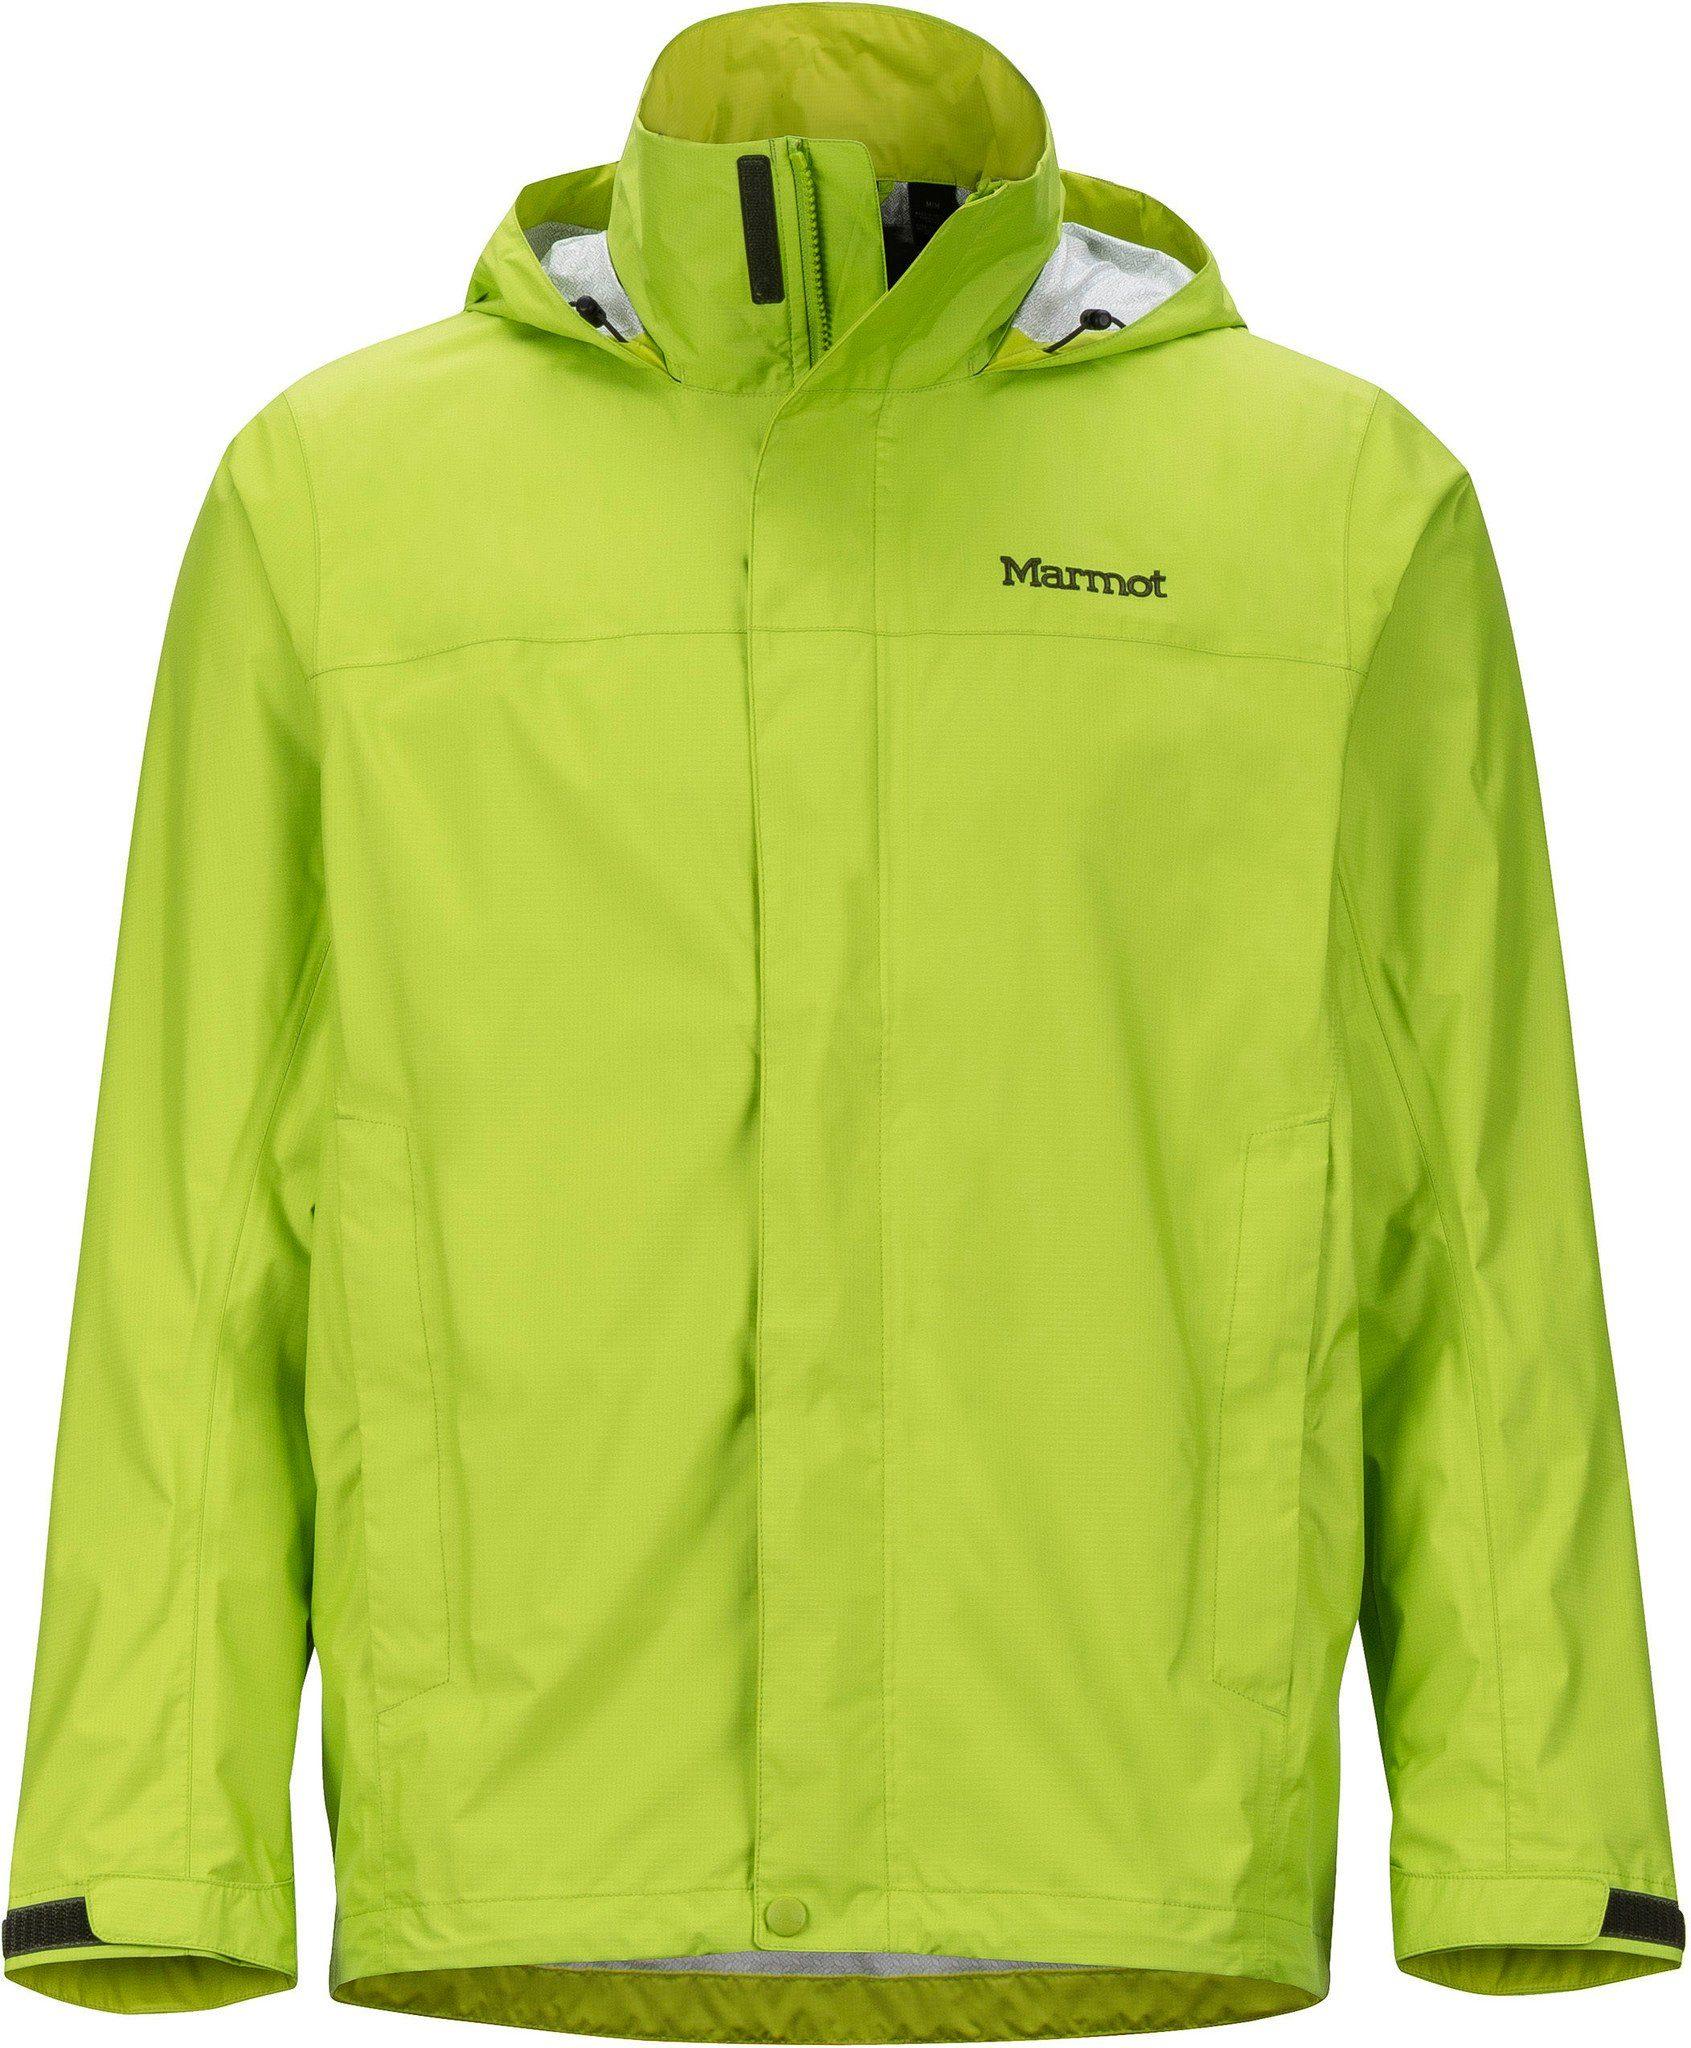 Marmot Outdoorjacke »PreCip Jacket Men«